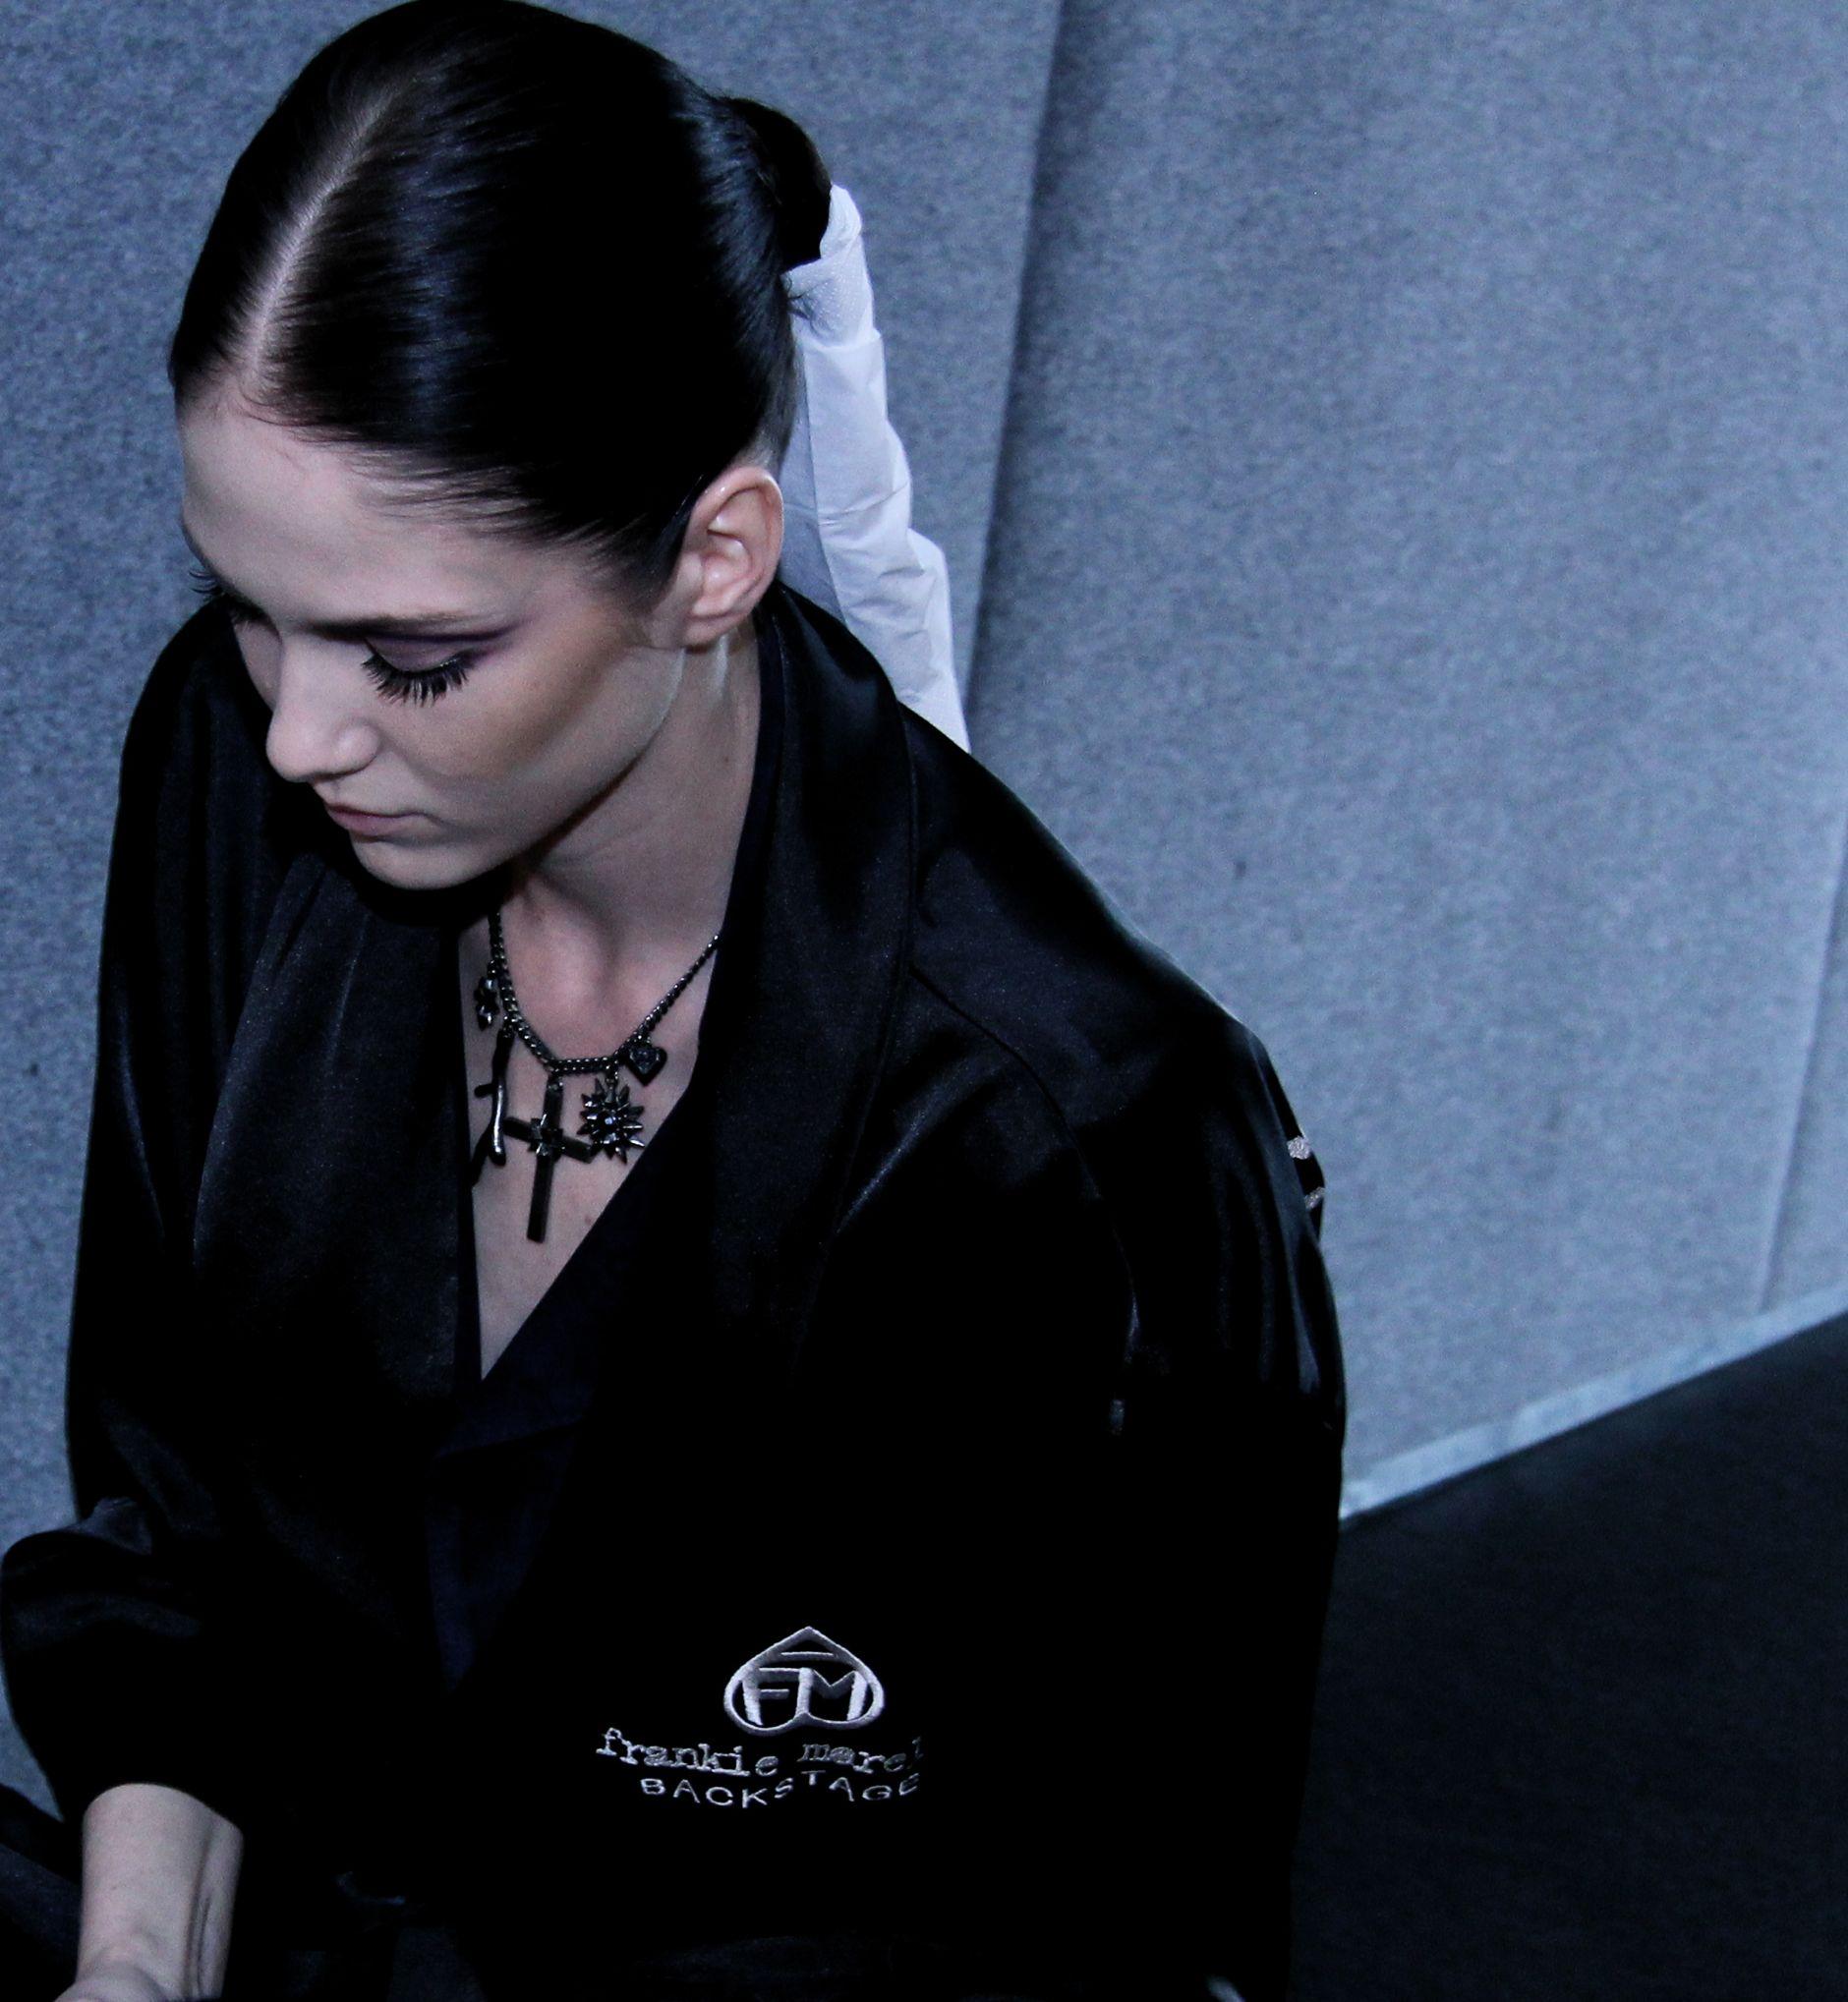 Backstage Fashion Model